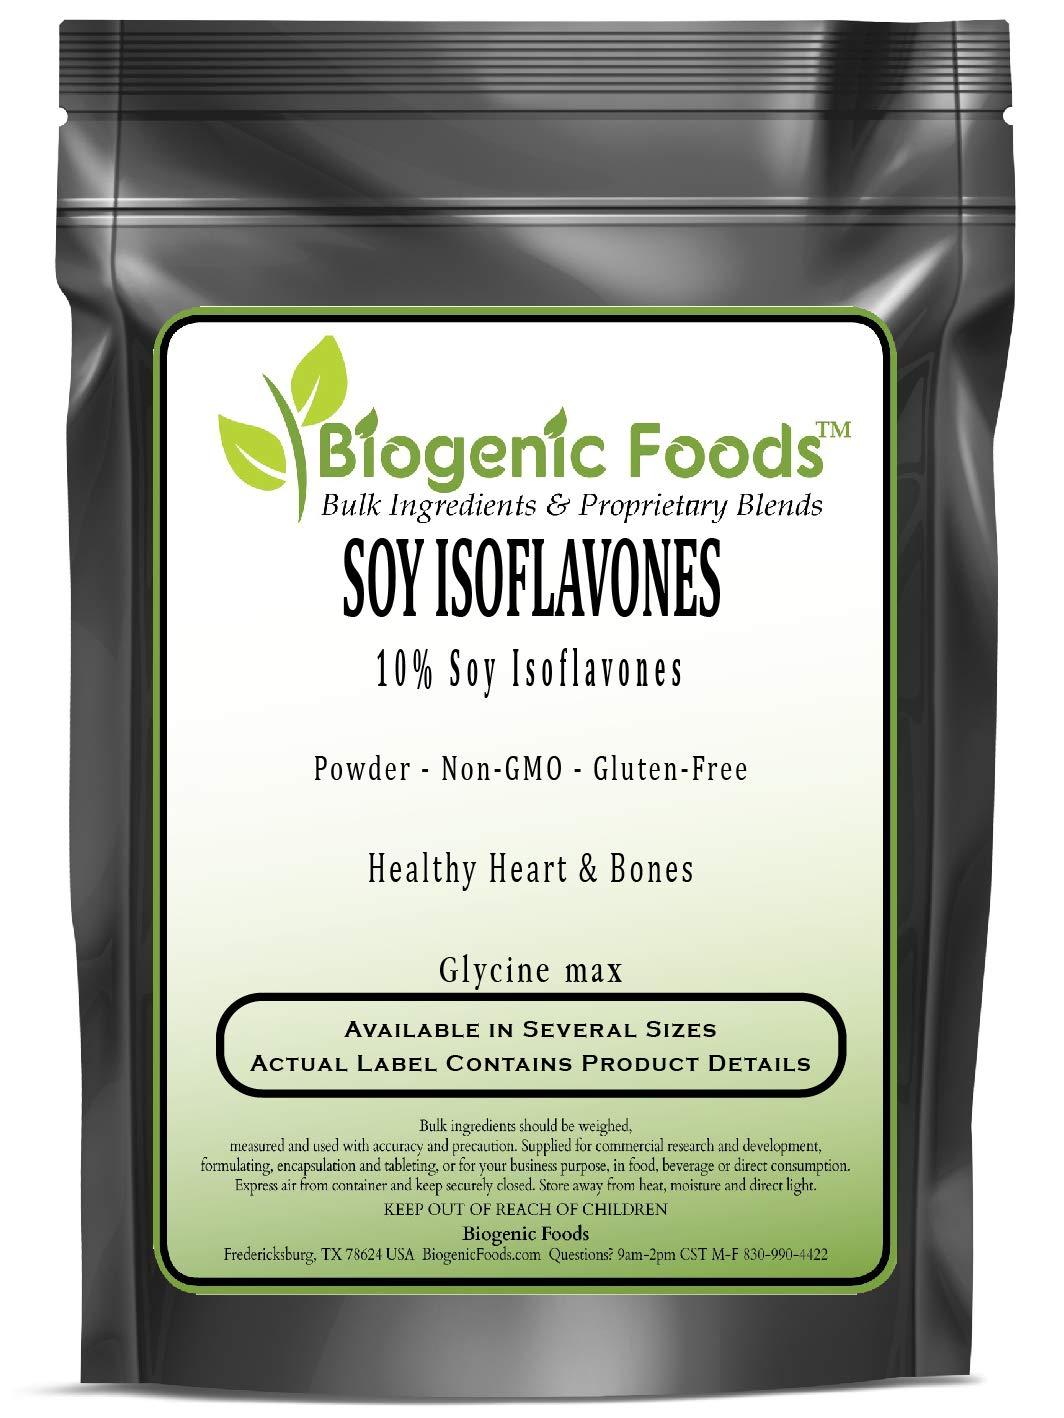 Soy Isoflavones - 10% Soy Isoflavones Powder Extract (Glycine max), 5 kg